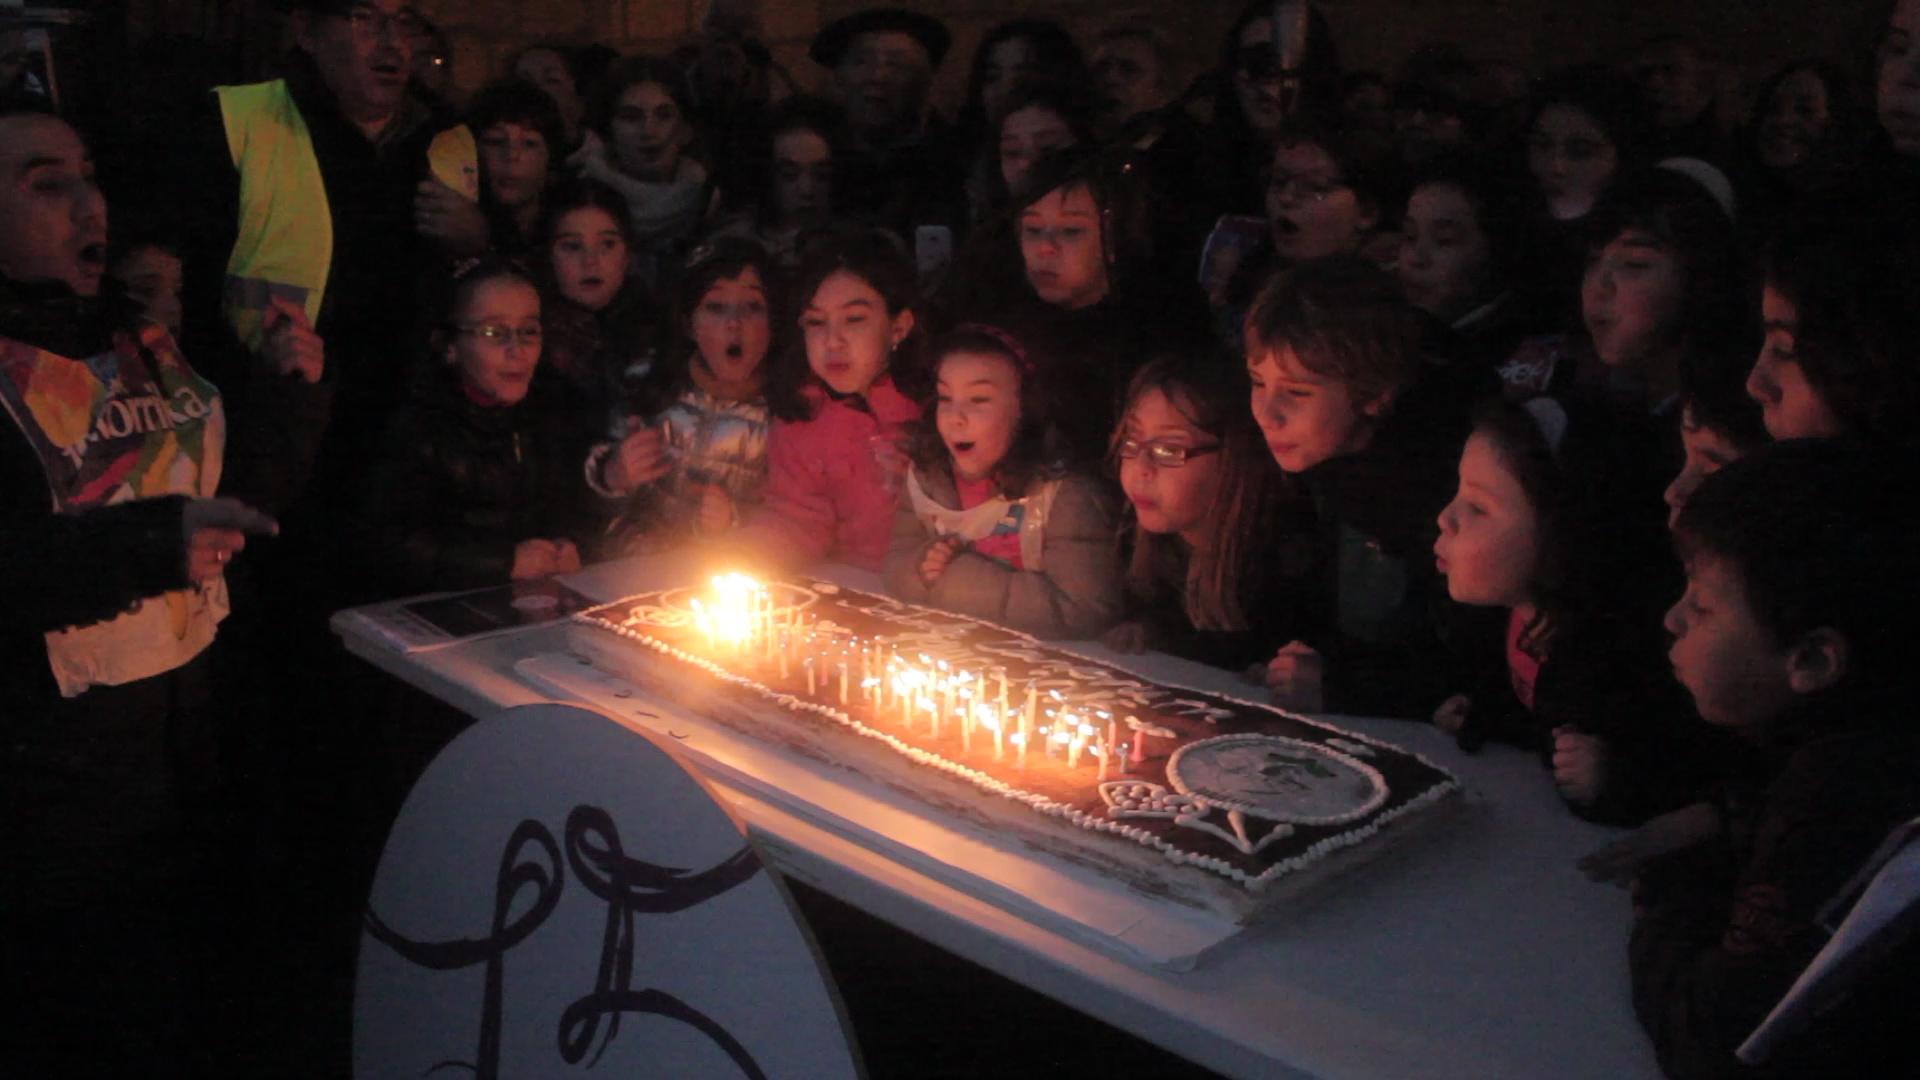 MARTXOAK 24 de marzo, la Schola celebra su 75 Cumpleaños